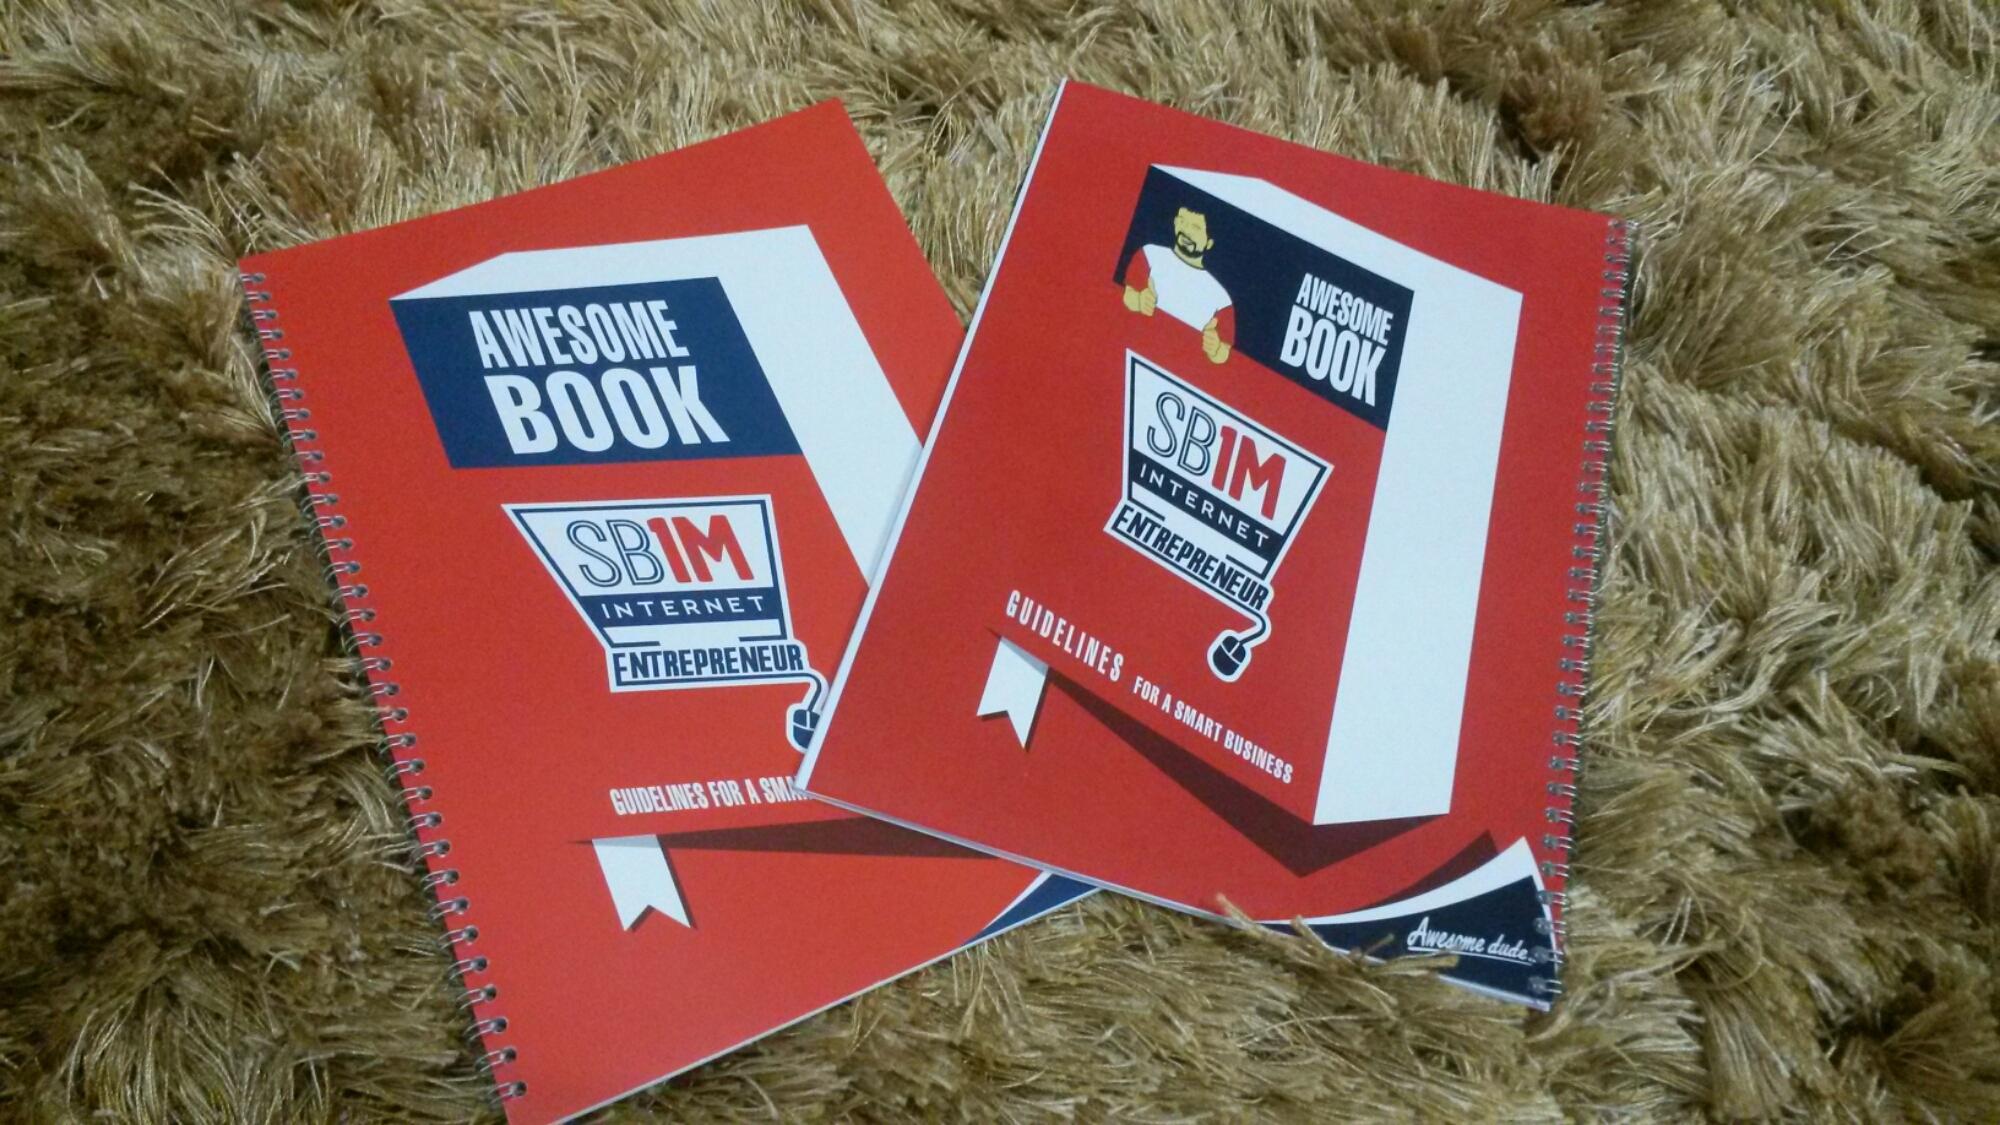 Buku panduan internet awesome book sb1m